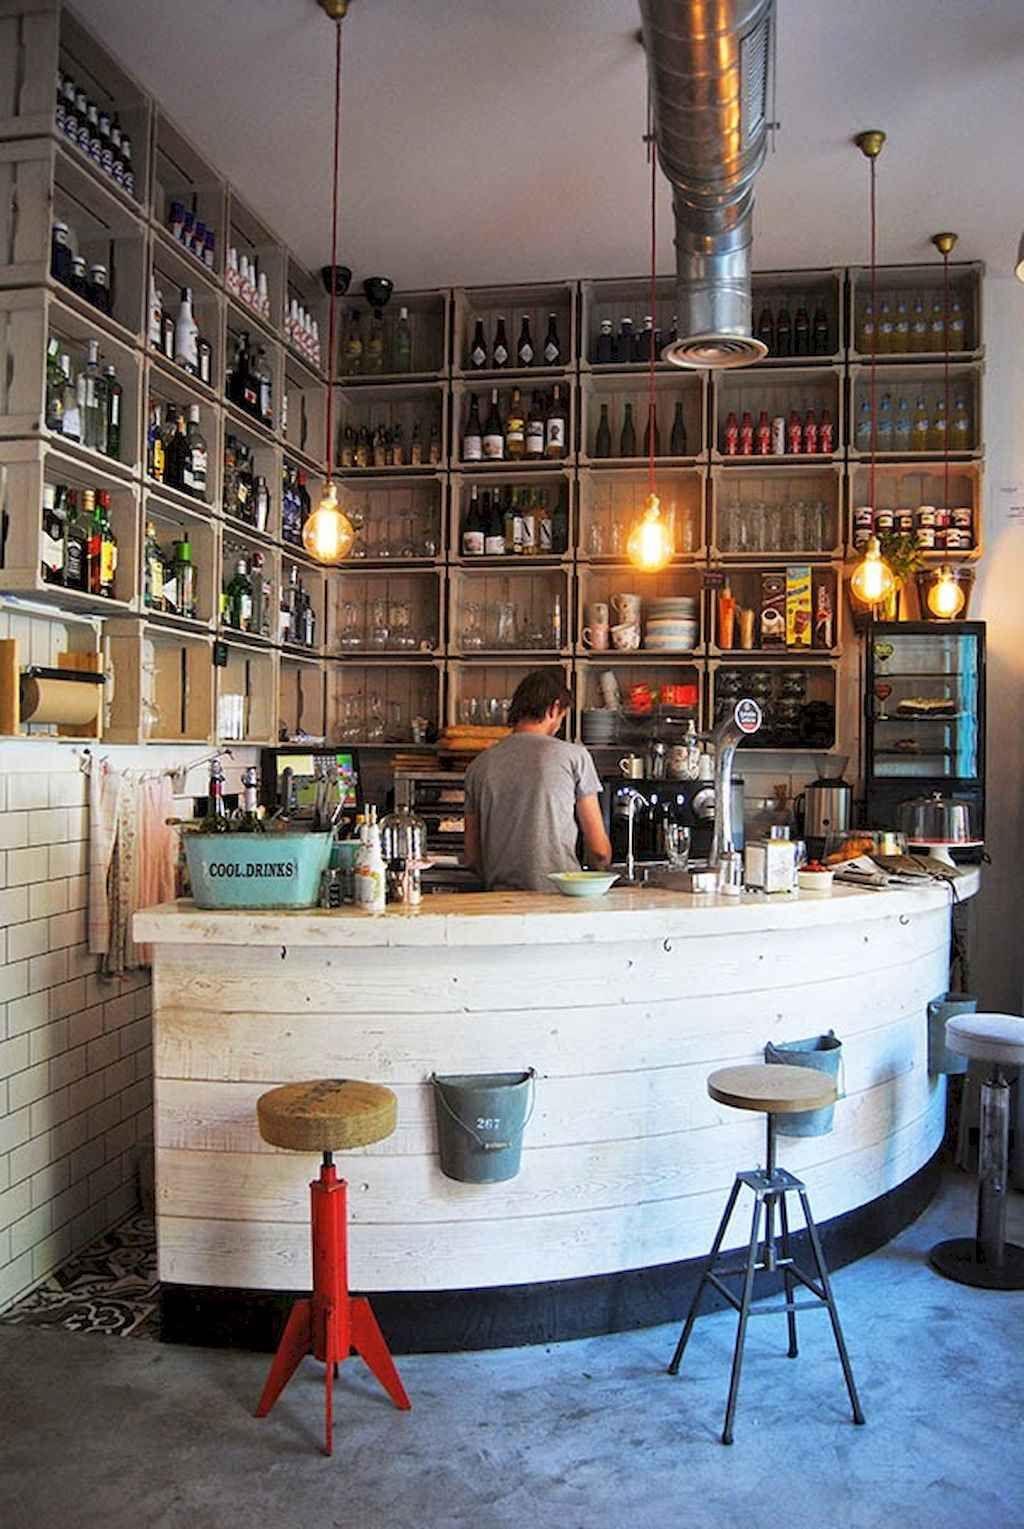 Nice 50 Best Vintage Home Bar Decor Ideas Https Livingmarch Com 50 Vintage Bar Decor Ideas Home Bar Decor Home Bar Designs Diy Home Bar